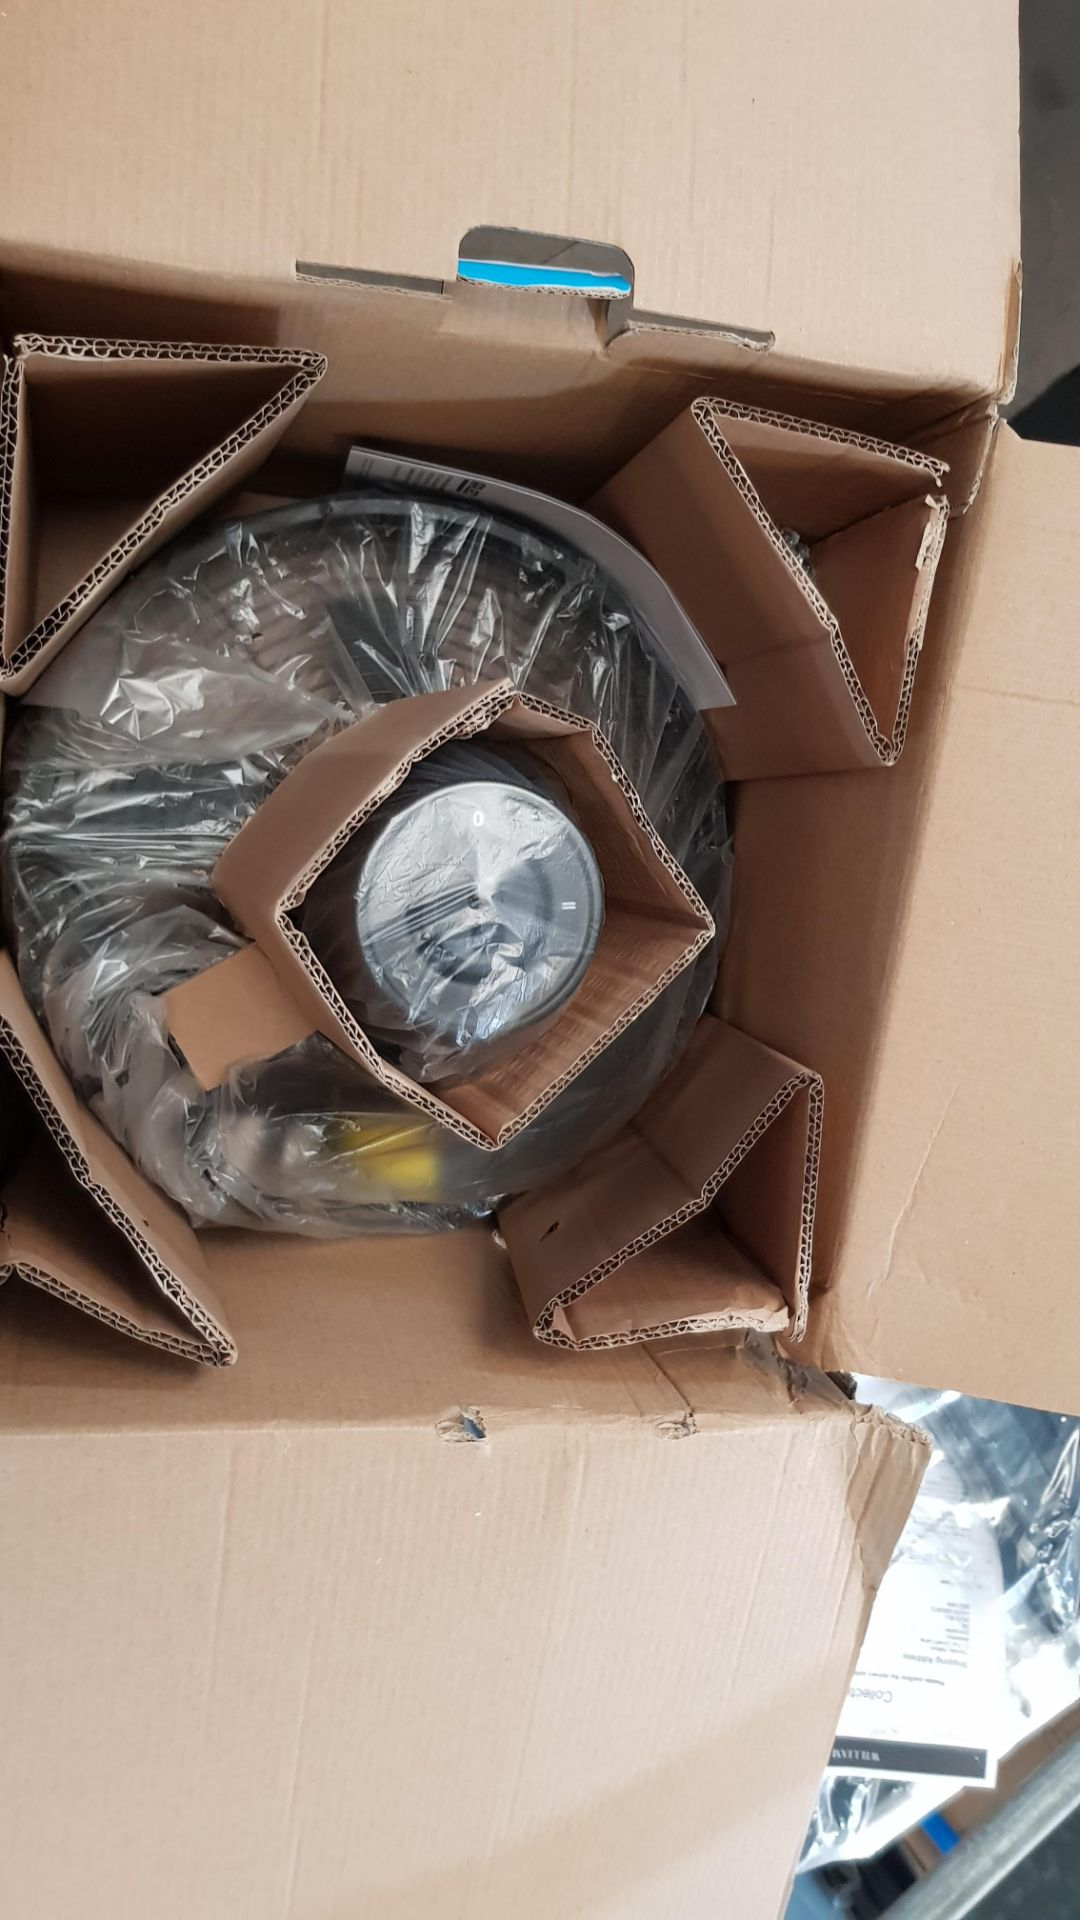 "(P9) 2x Arlec 12"" Matt Black 5 Blade Metal Desk Fan RRP £39 Each. Both Units Appear As New, But Da - Image 6 of 6"